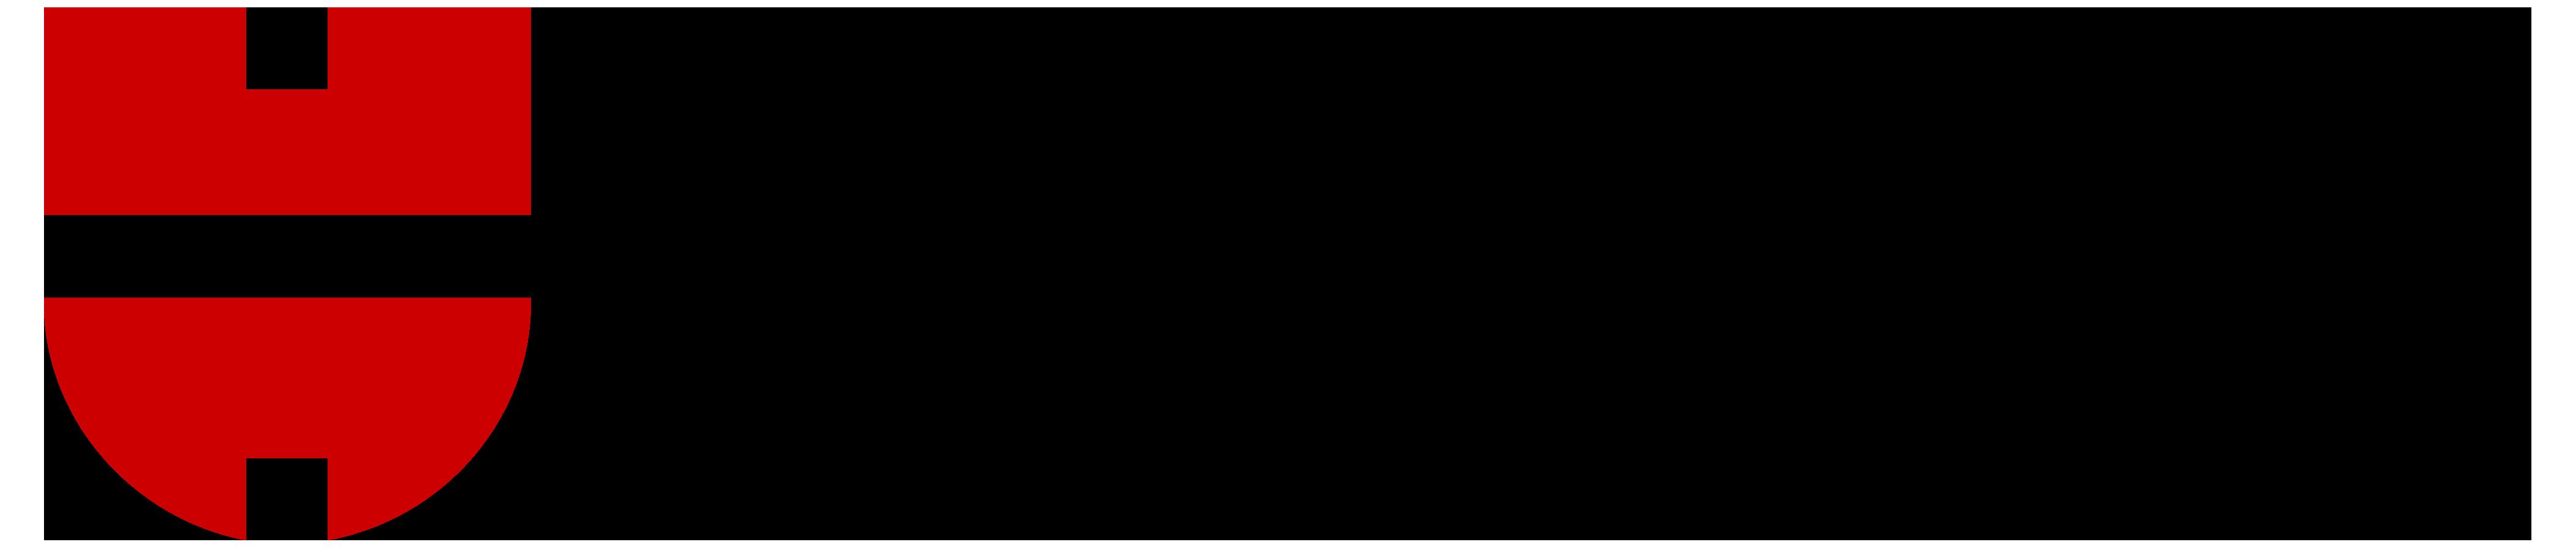 Wurth_logo_logotype